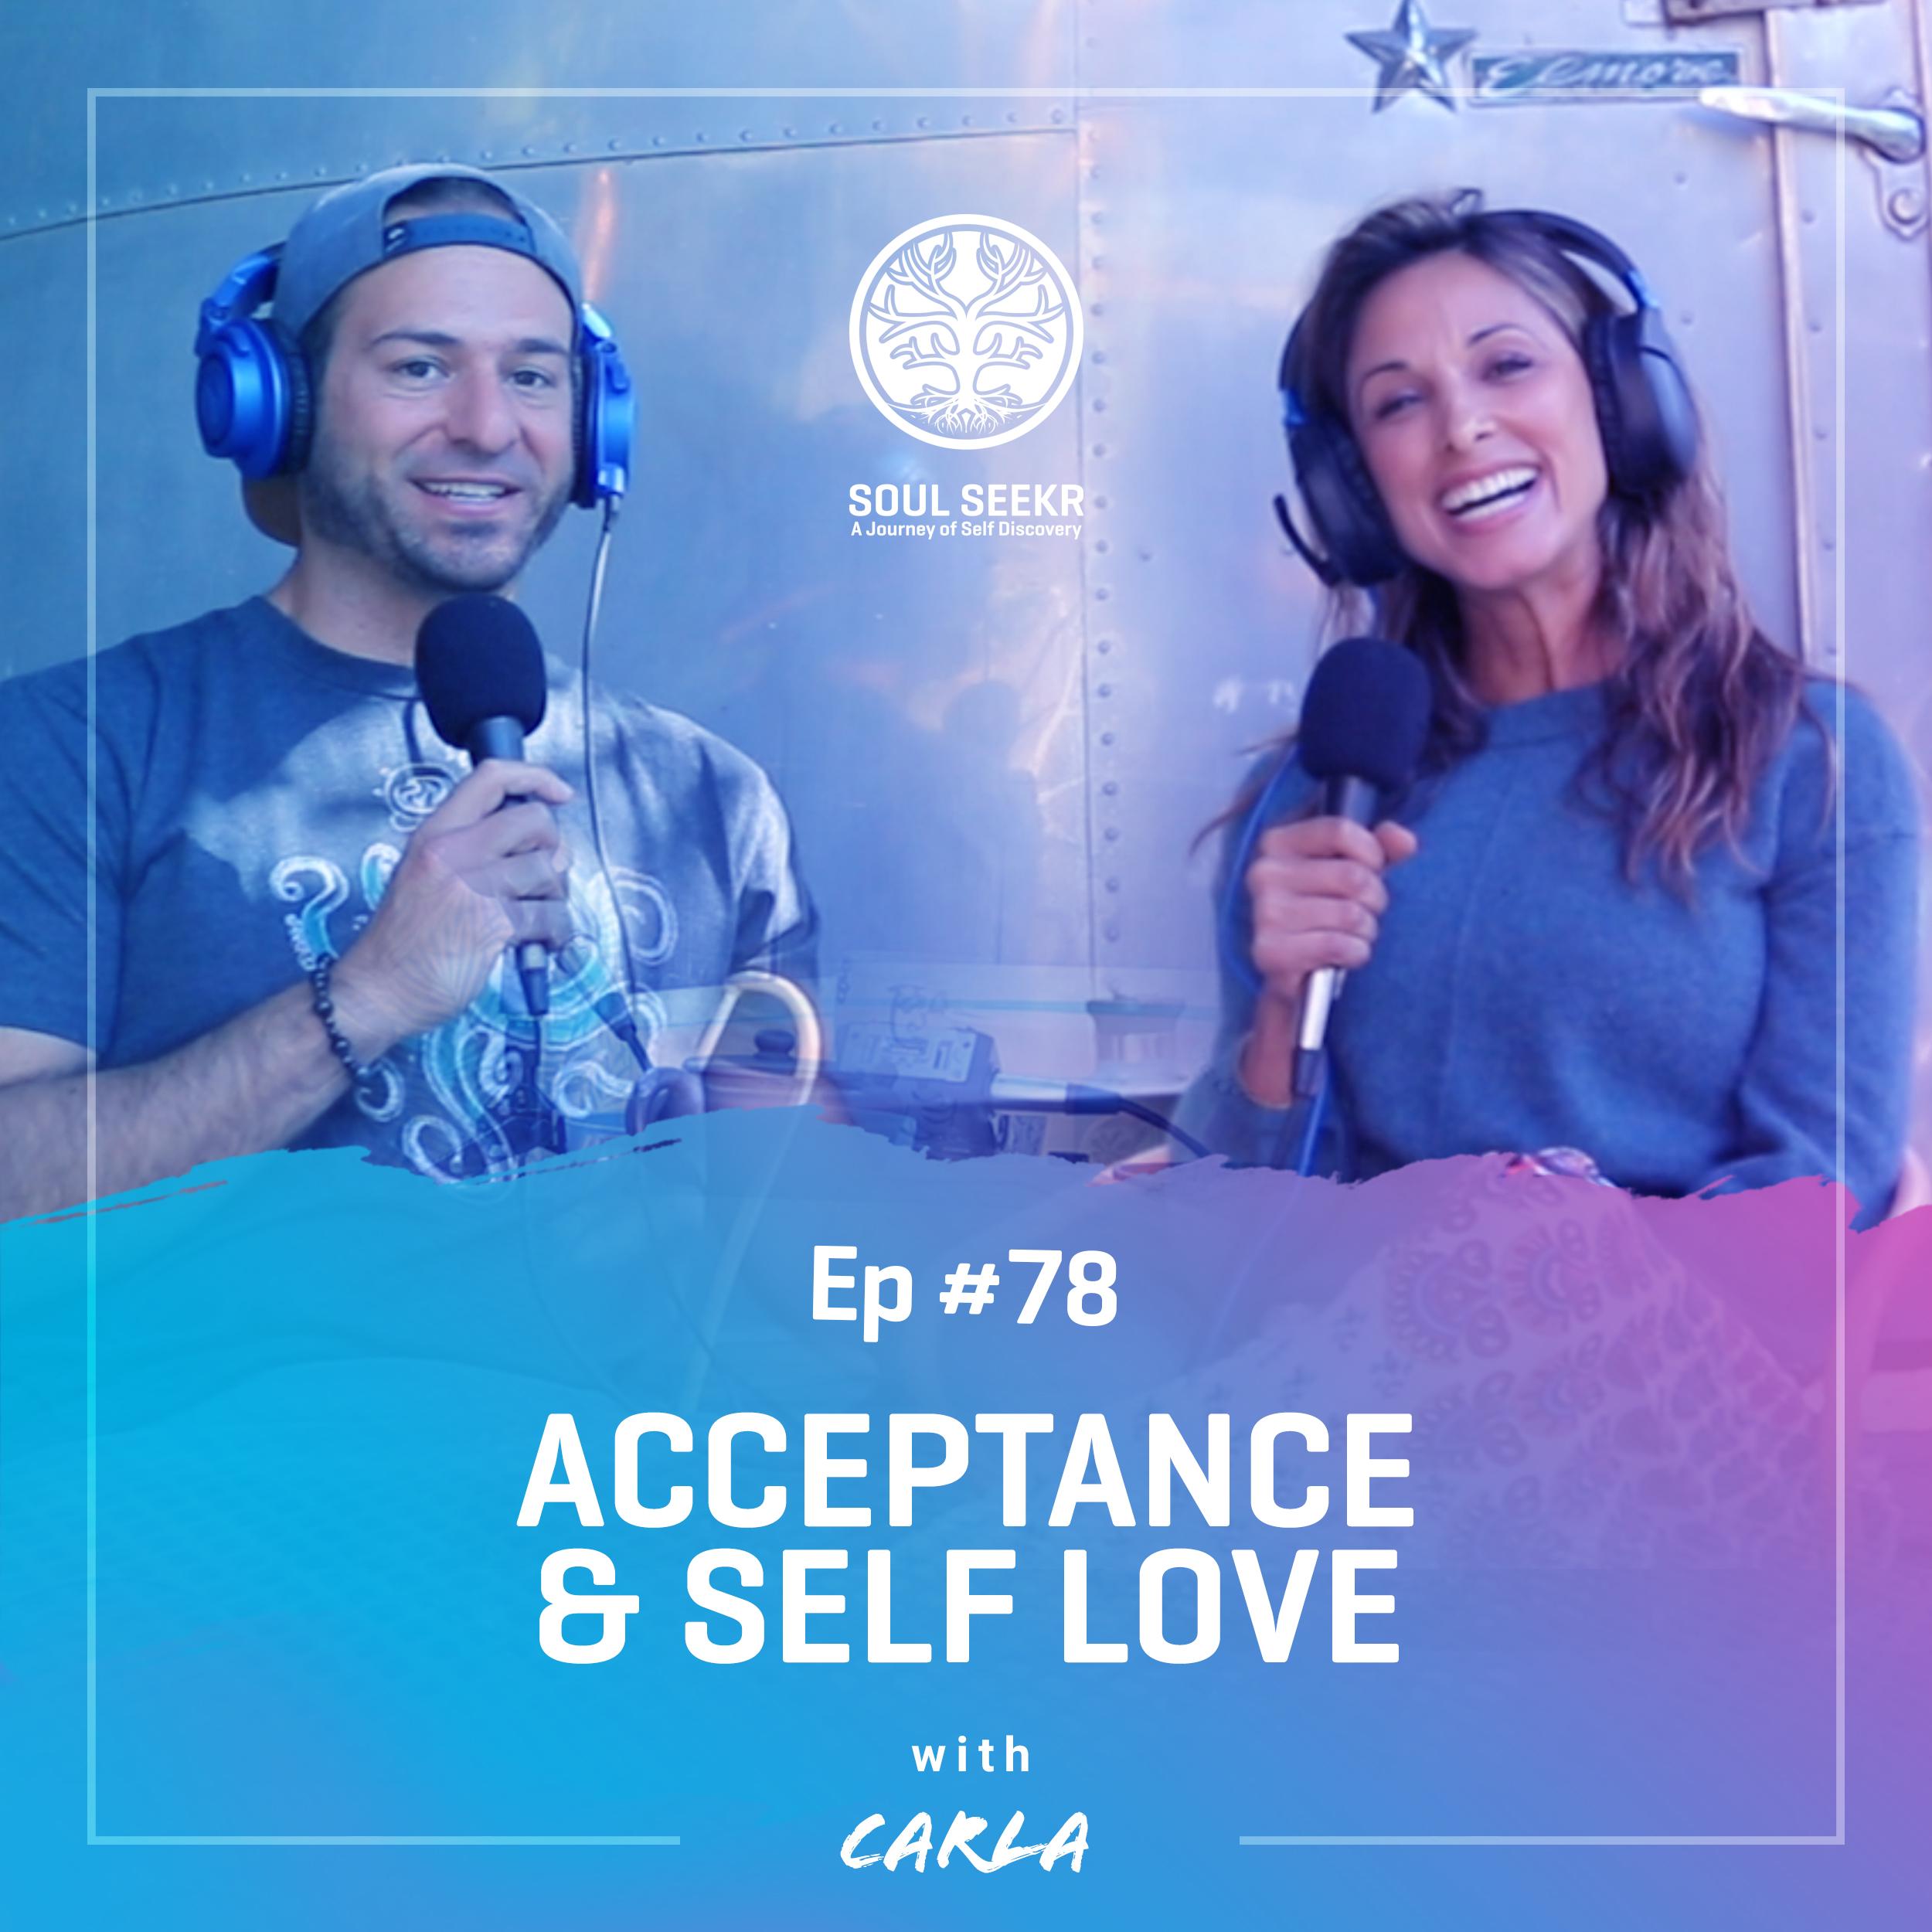 #78: Acceptance & Self Love with Carla